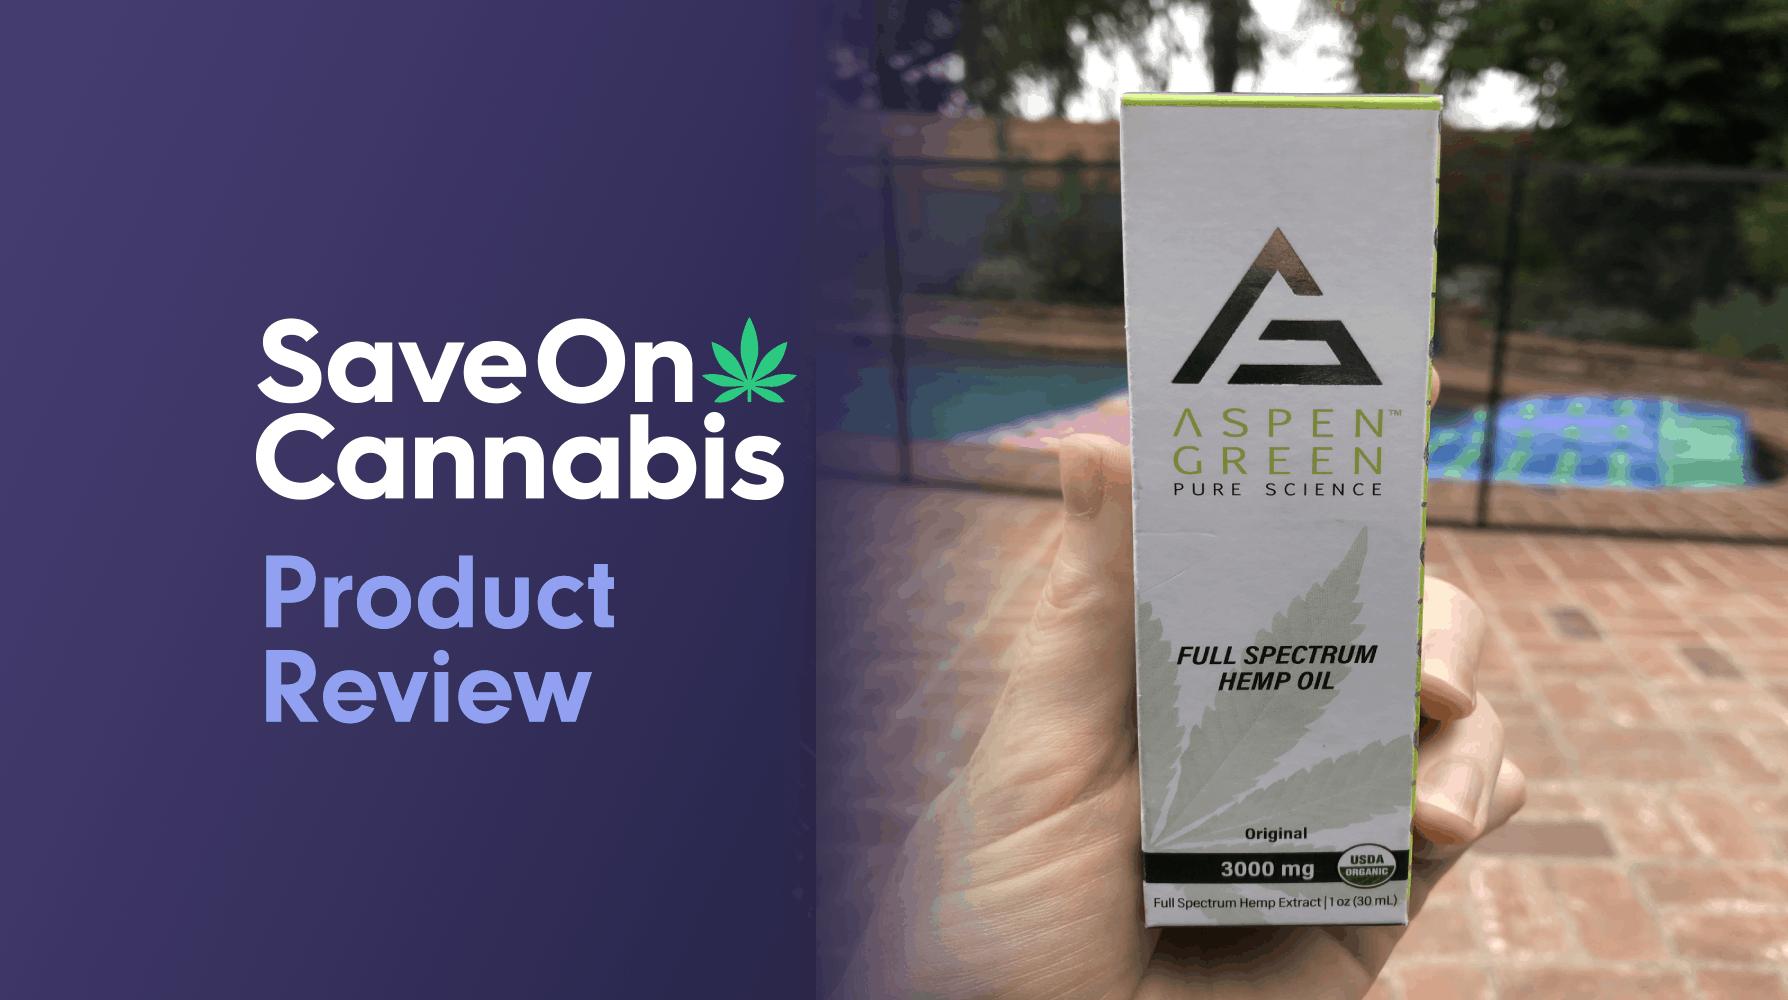 aspen green full spectrum hemp oil 3,000 mg save on cannabis review website